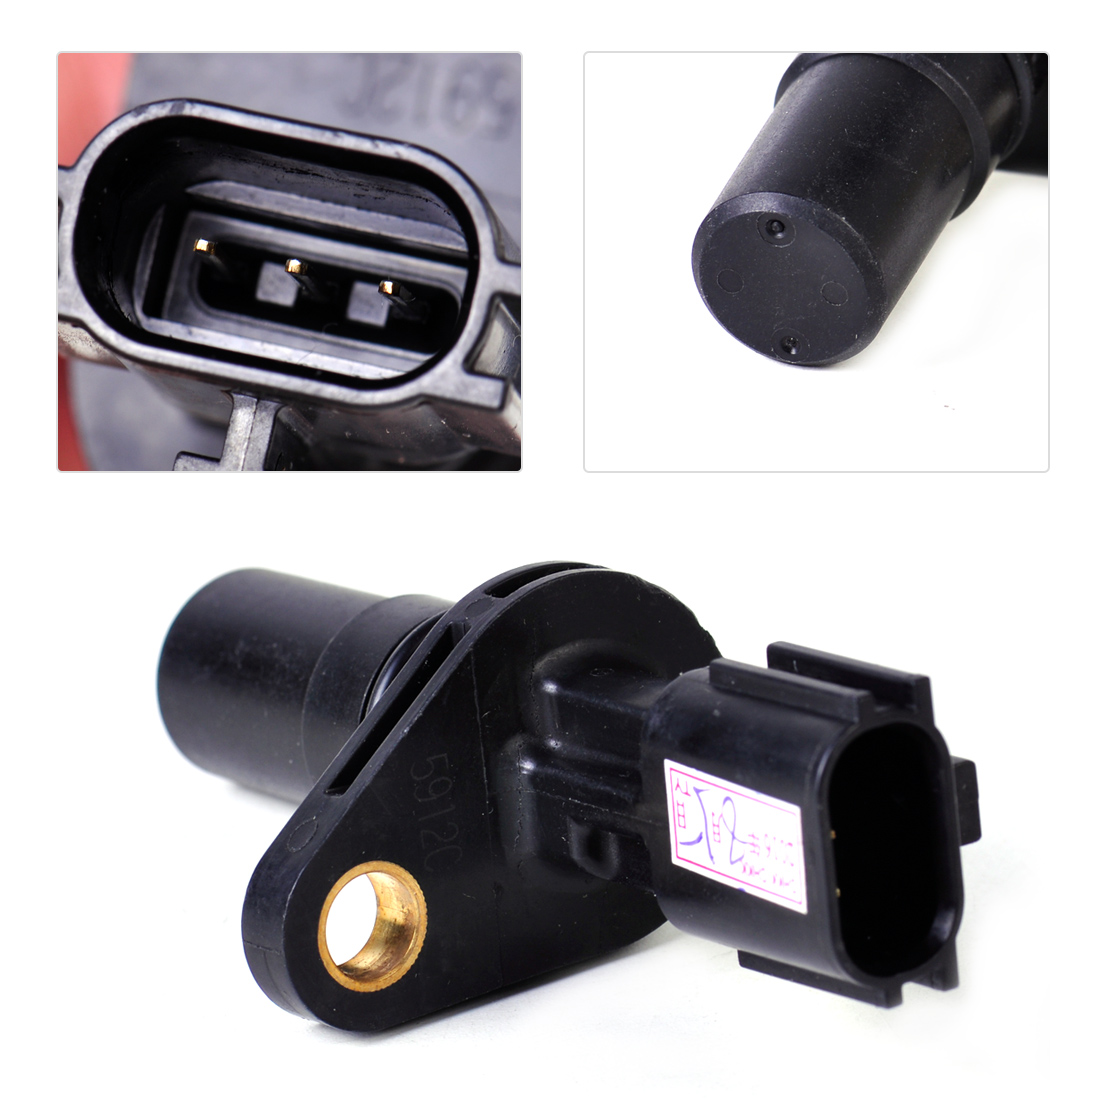 US $12 55 20% OFF DWCX 31935 1XF01 31935 X420B Transmission Speed Sensor  for Nissan Altima Juke NV200 Rogue Sentra Versa 4Cyl-in Speed Sensor from